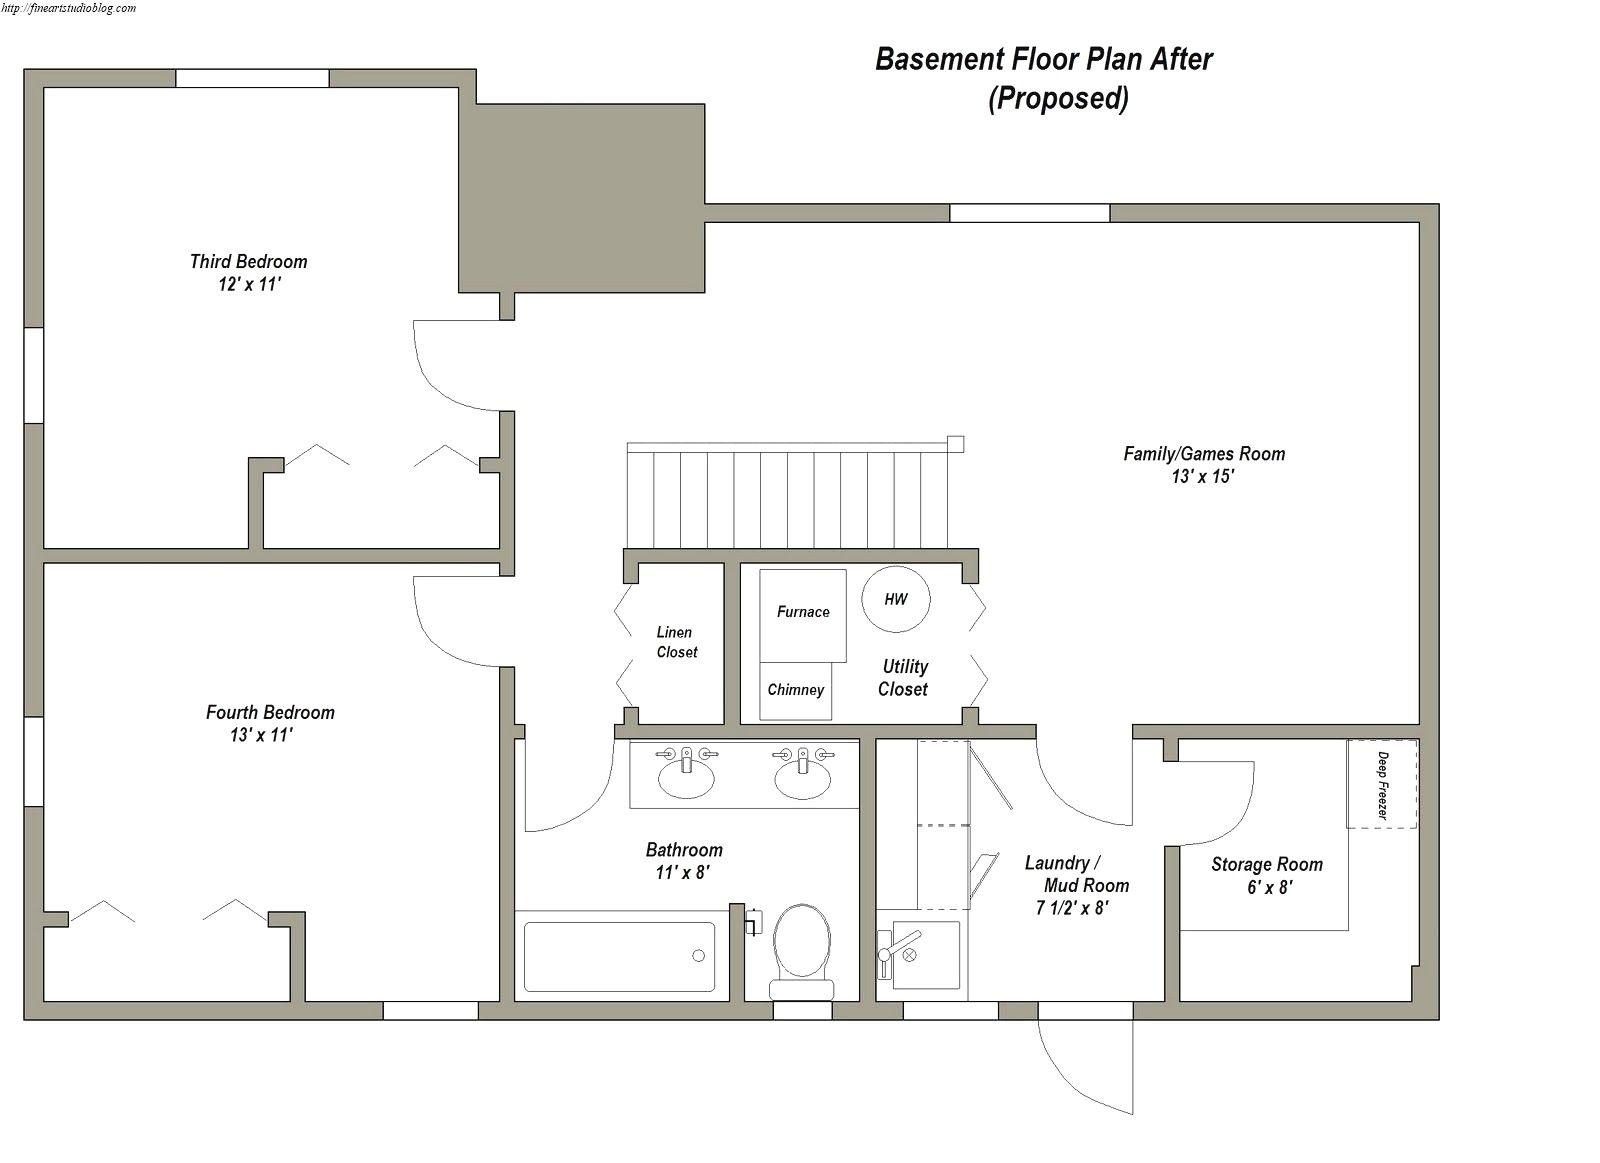 37 Marvelous Basement Design Plans Concept In 2020 Basement Floor Plans Basement Flooring Basement Design